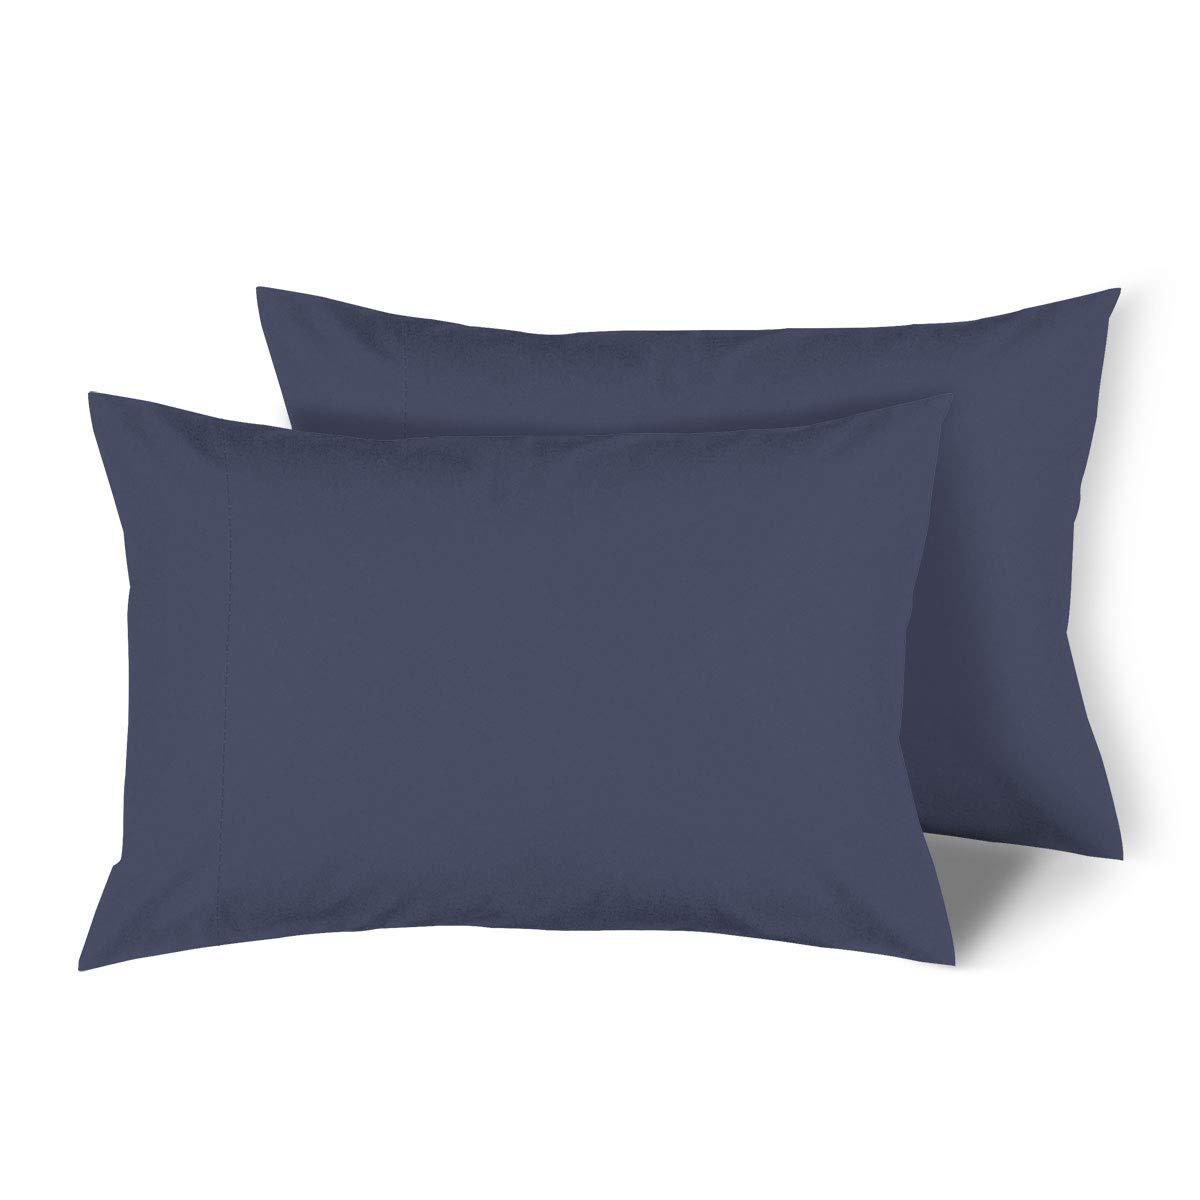 H Bedding Extra Soft Microfiber Pillow cases - Standard, Set of 2, Navy Blue